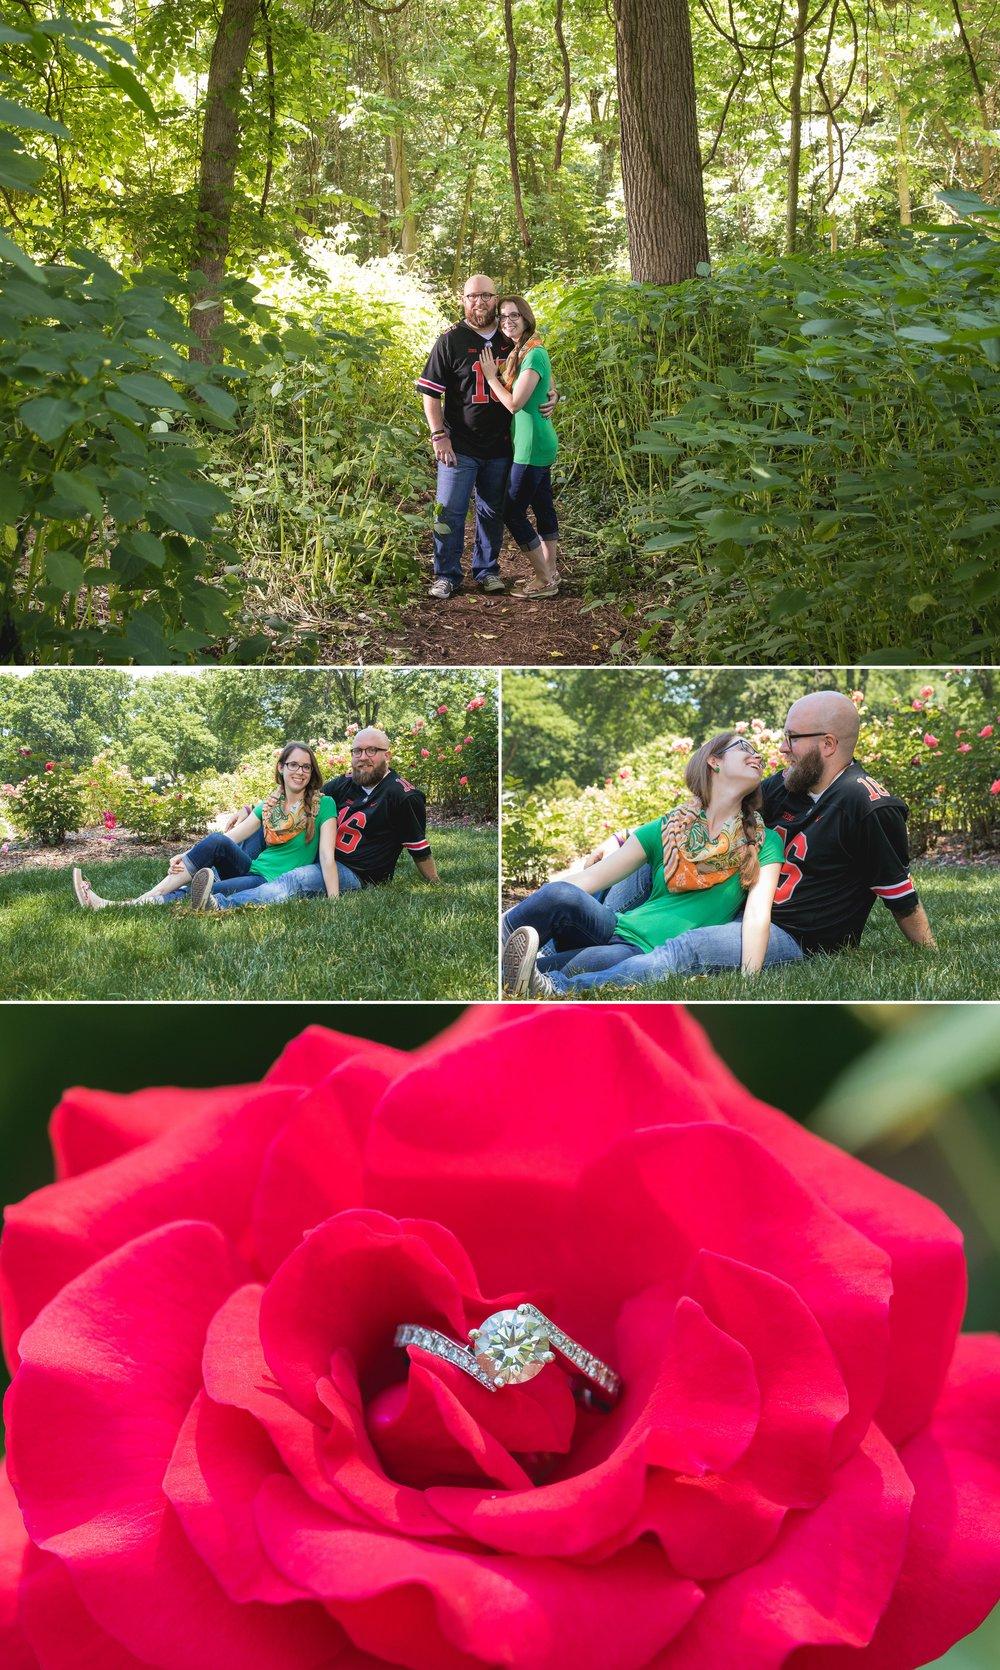 summer-engagement-portrait-session-park-of-roses-clintonville-columbus-ohio-muschlitz-photography-004.JPG